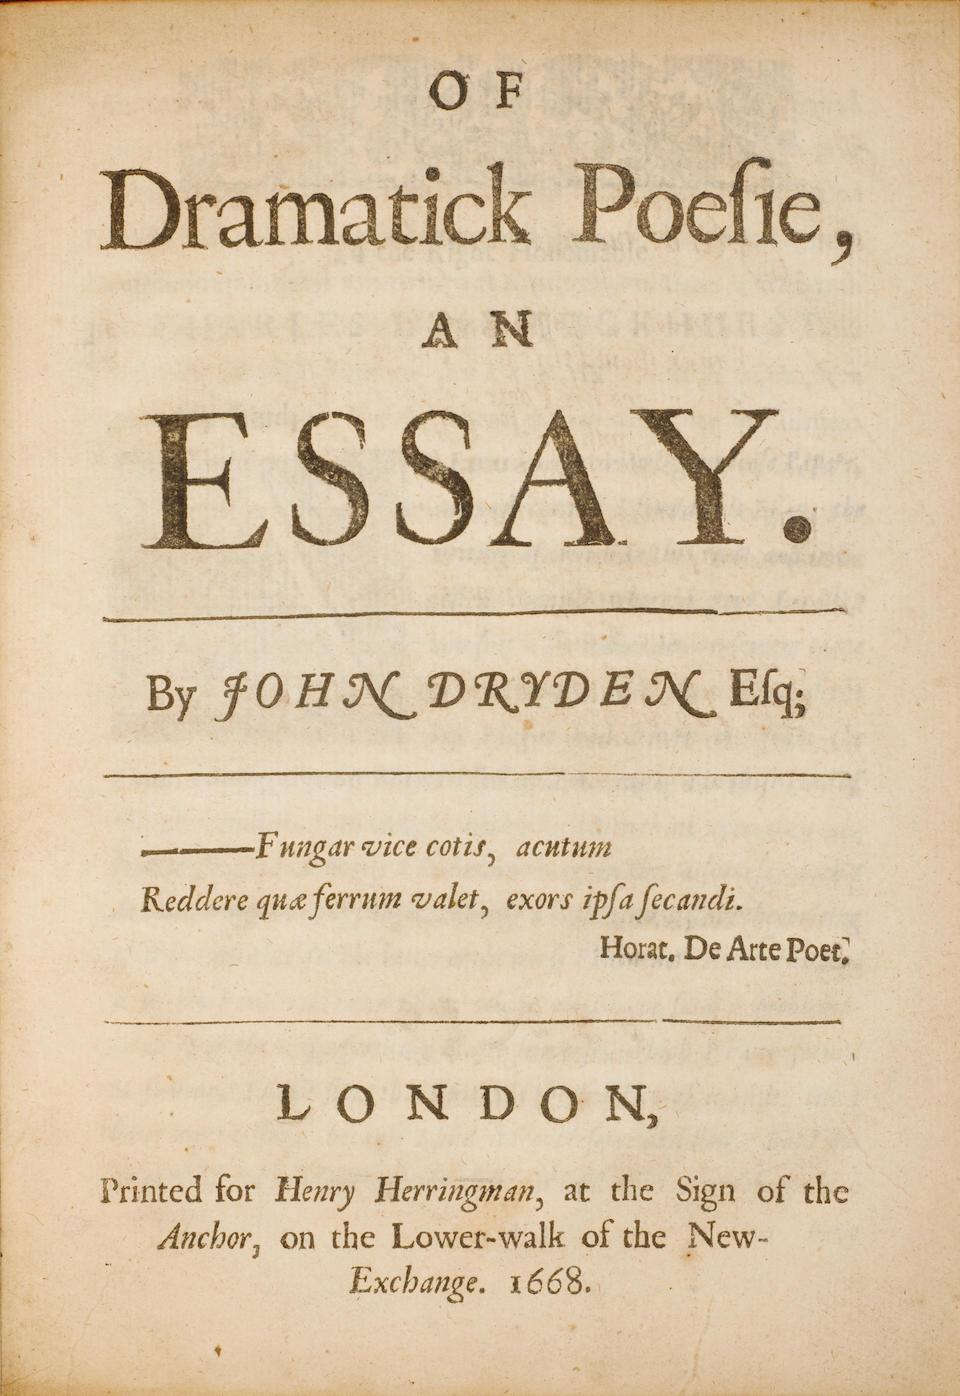 DRYDEN, JOHN. 1631-1700. Of Dramatick Poesie, an Essay. London: Henry Herringman, 1668.